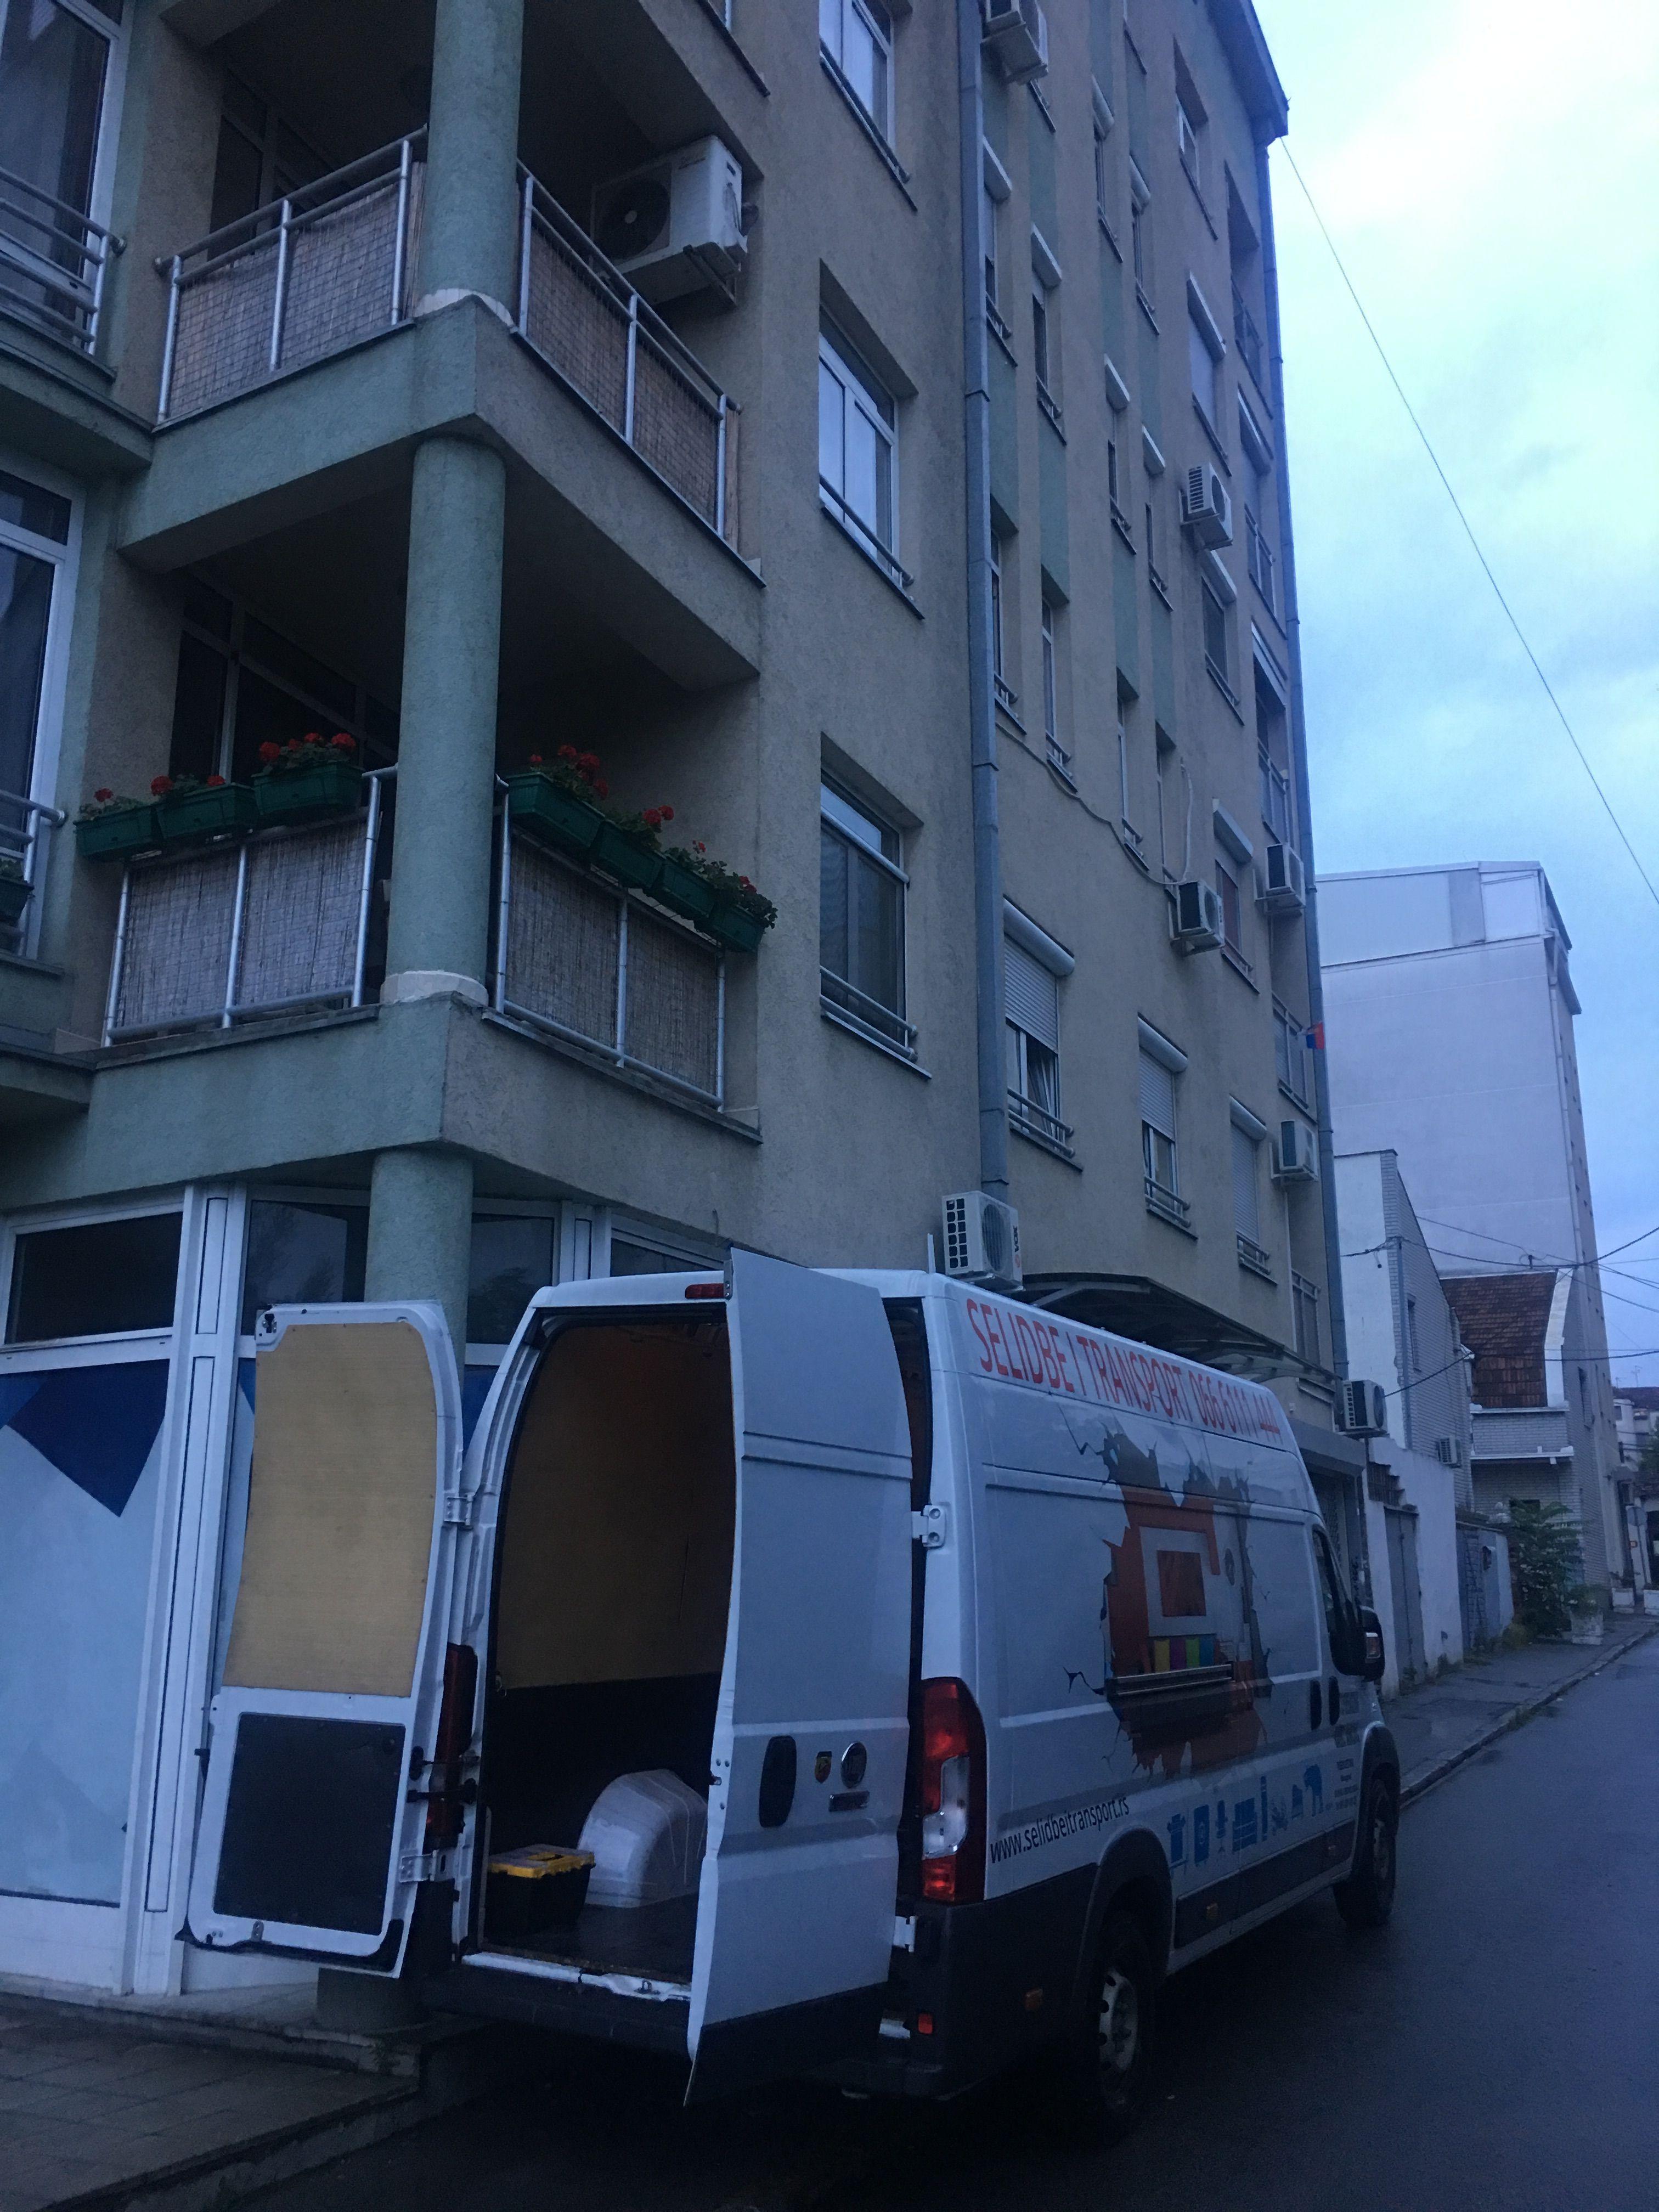 Selidbe Transport Kombiprevoz Selidbe Transport Kombi Kamion  # Muebles Doo Beograd